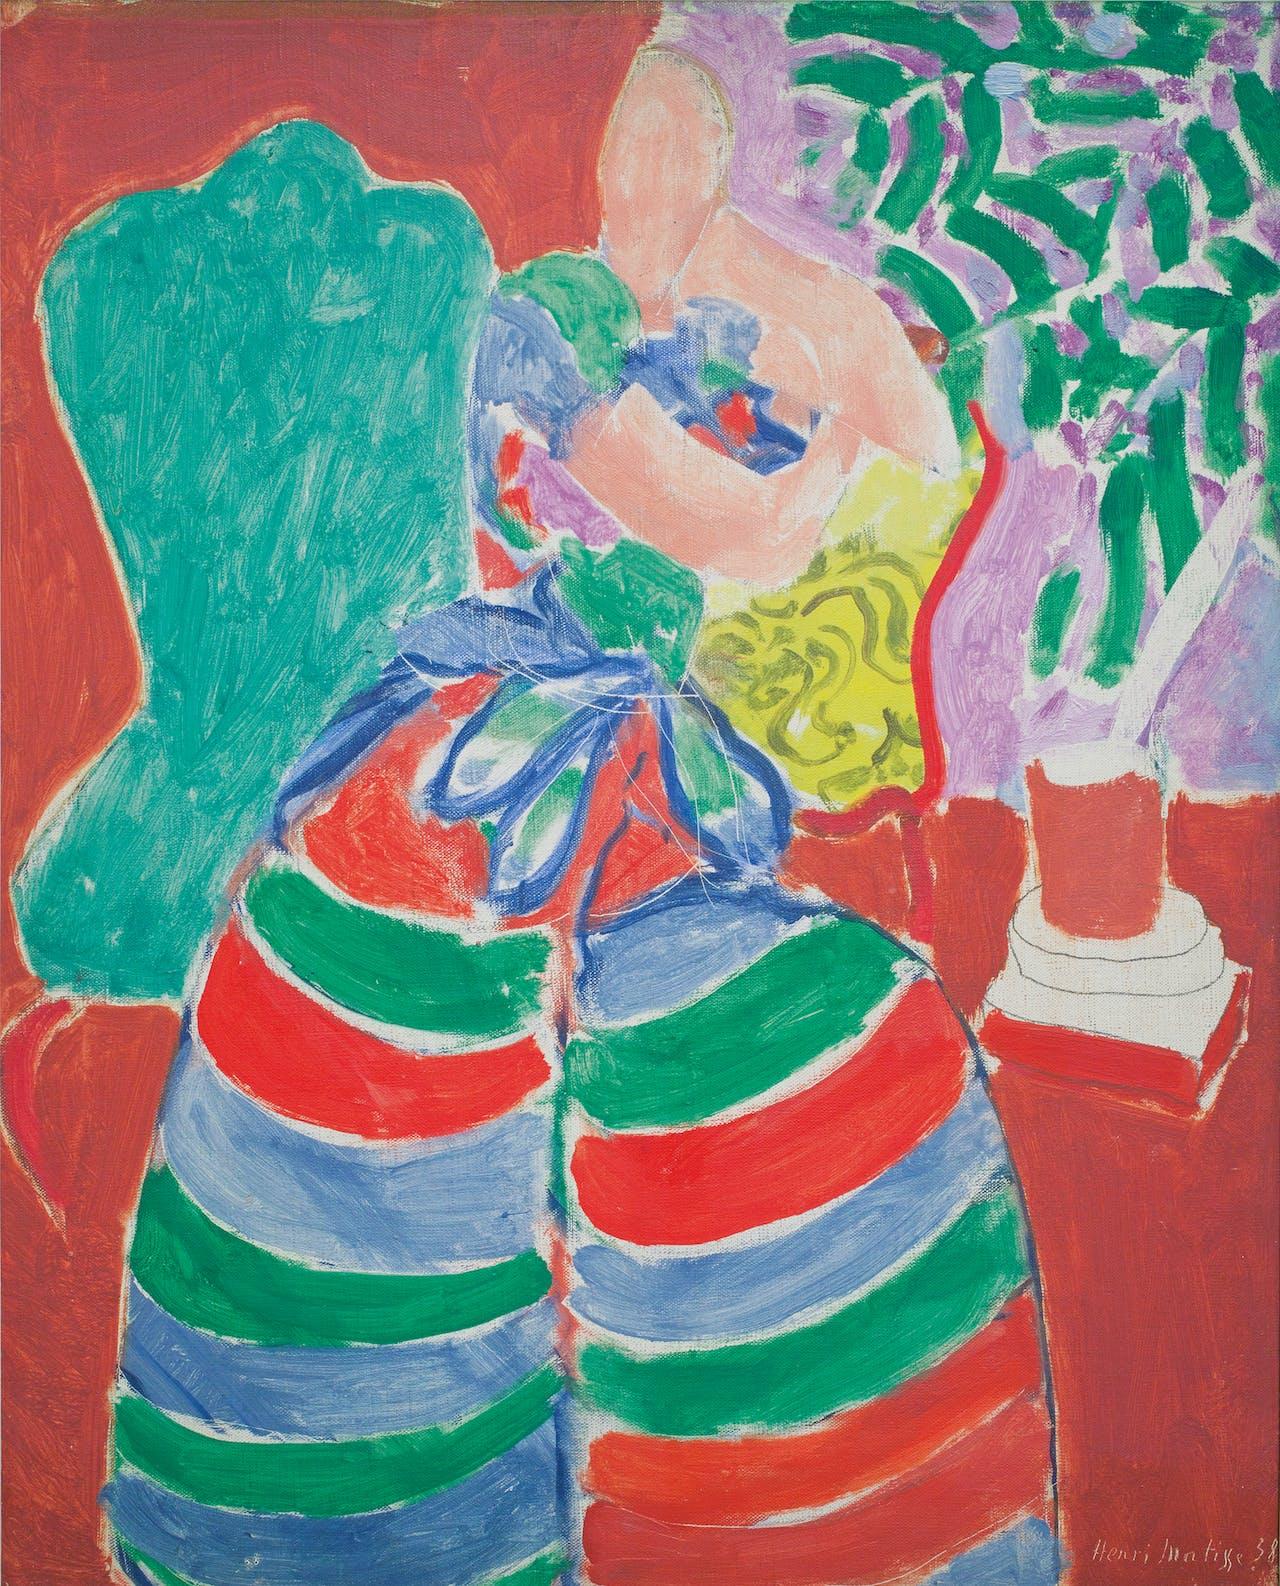 'La robe rayée' (de gestreepte jurk), 1938, Matisse.